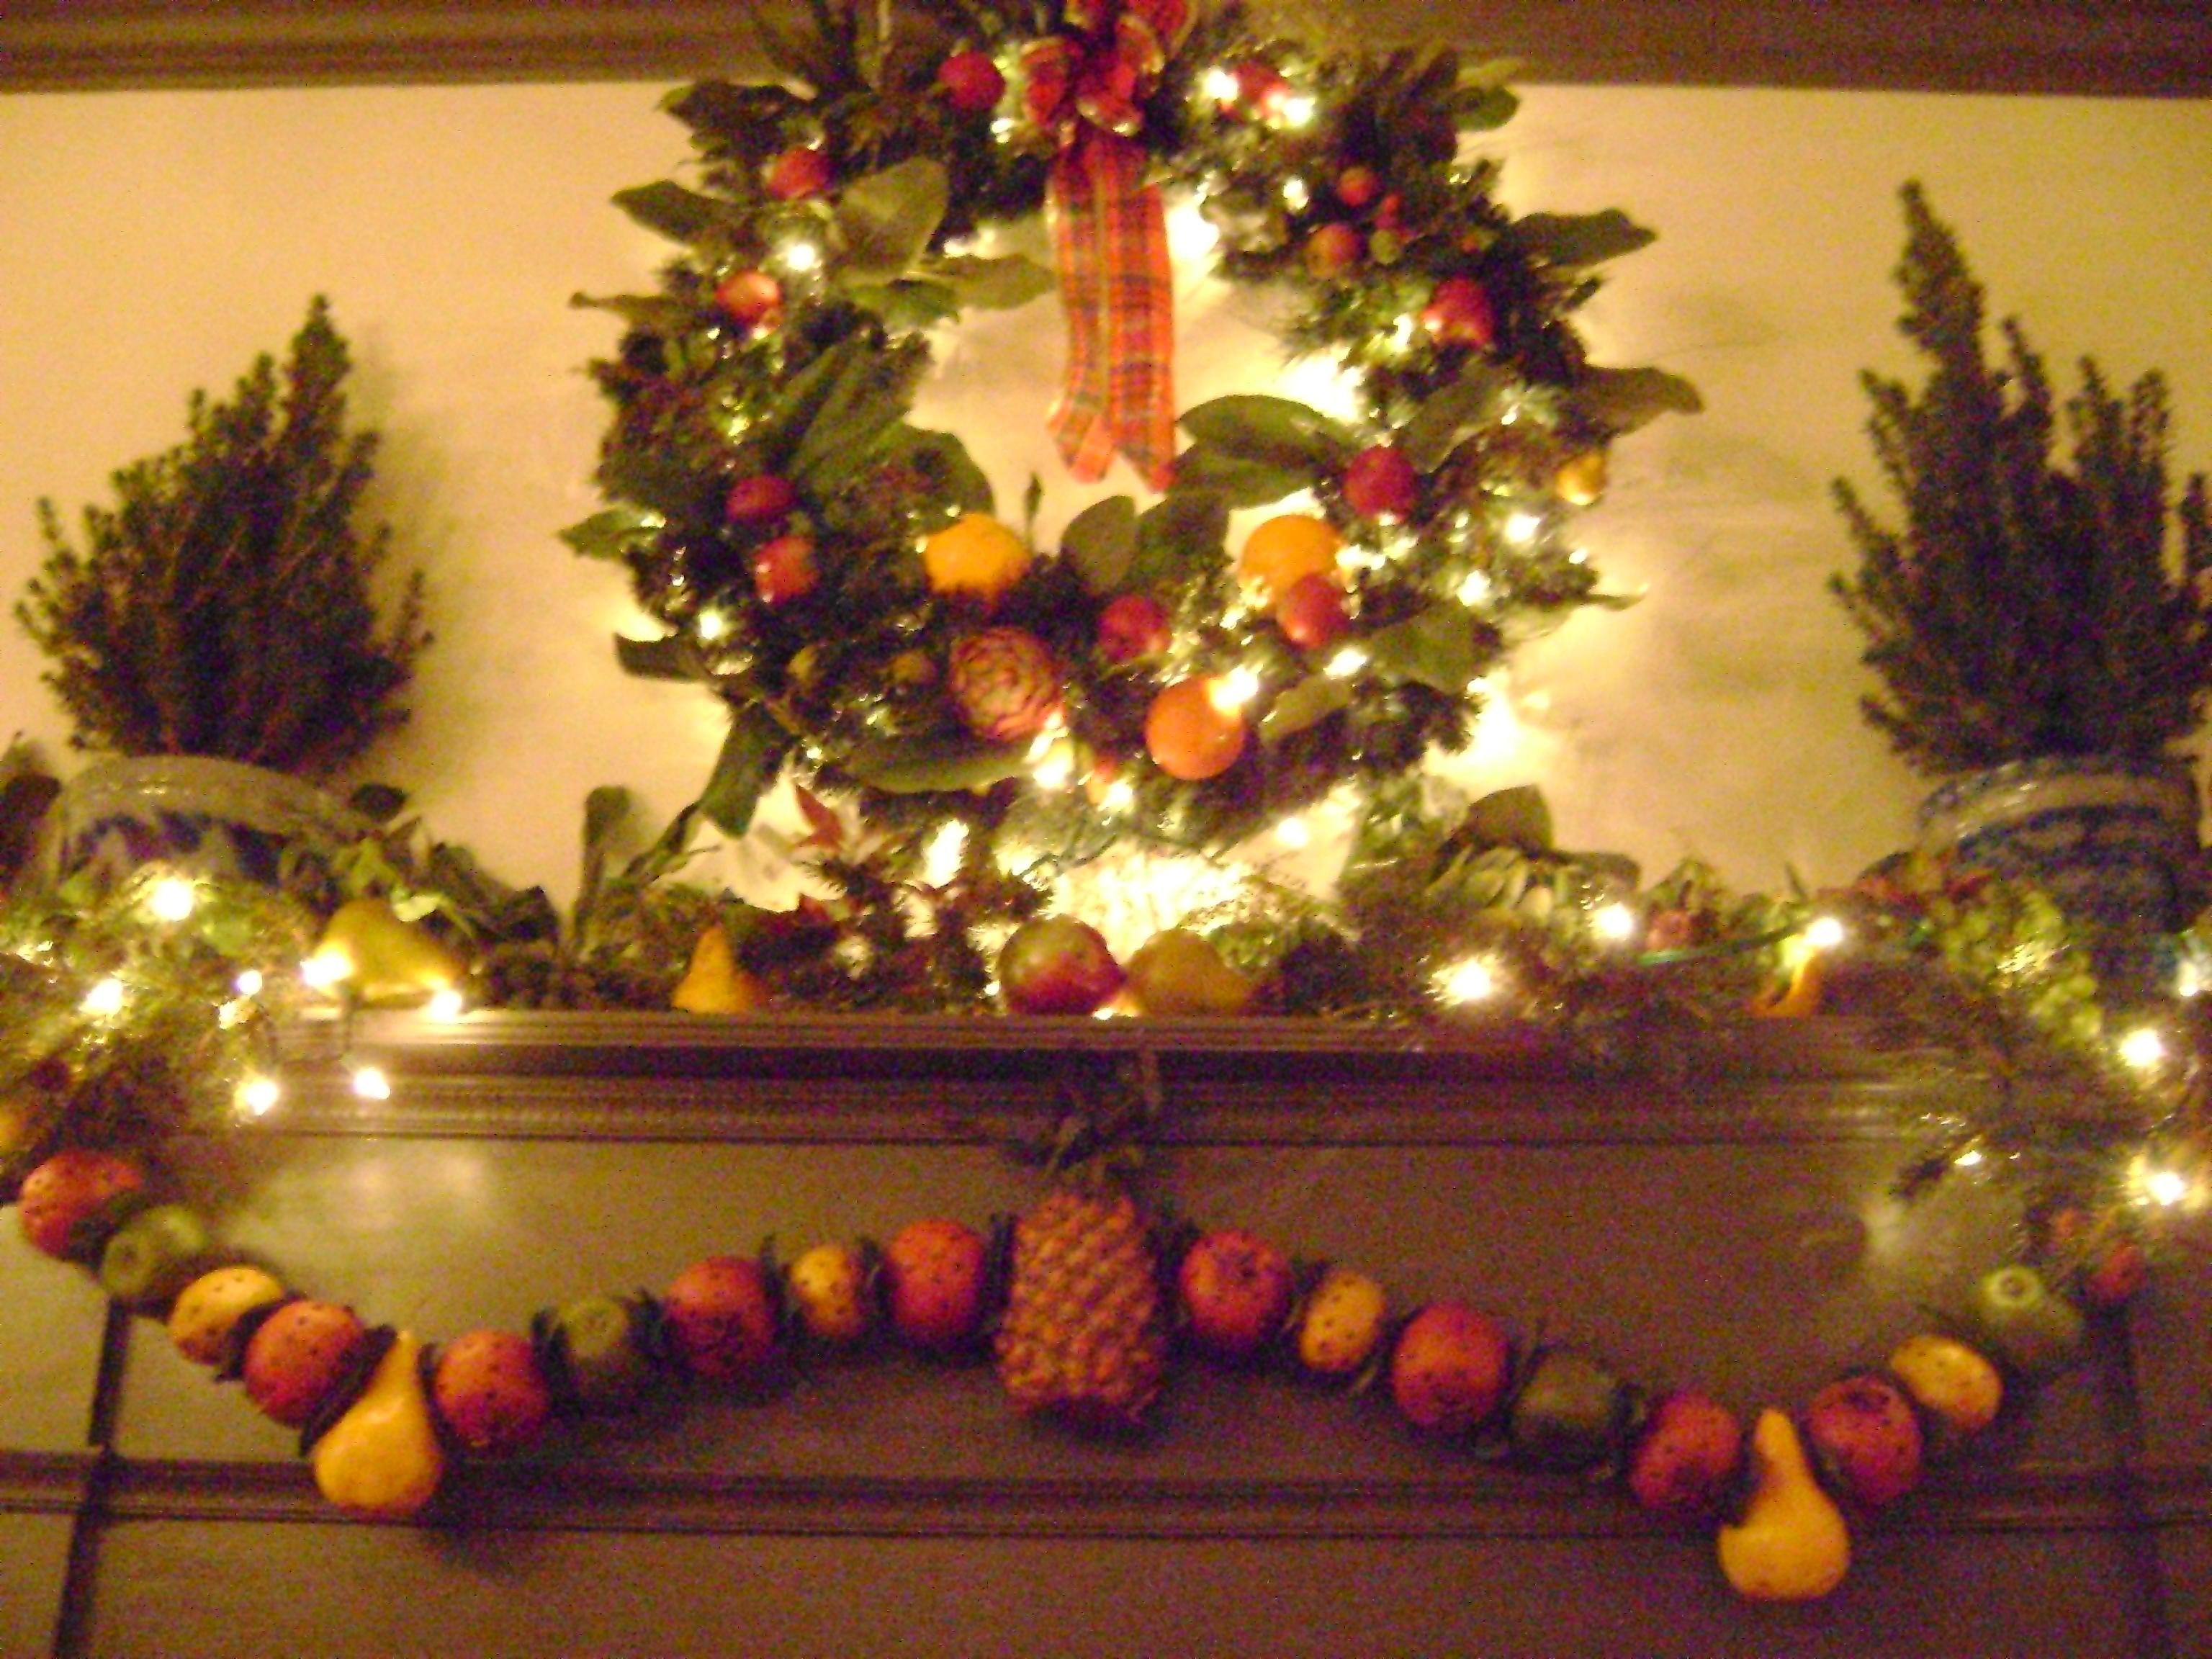 2015 My Christmas House Tour - Vintage American Home